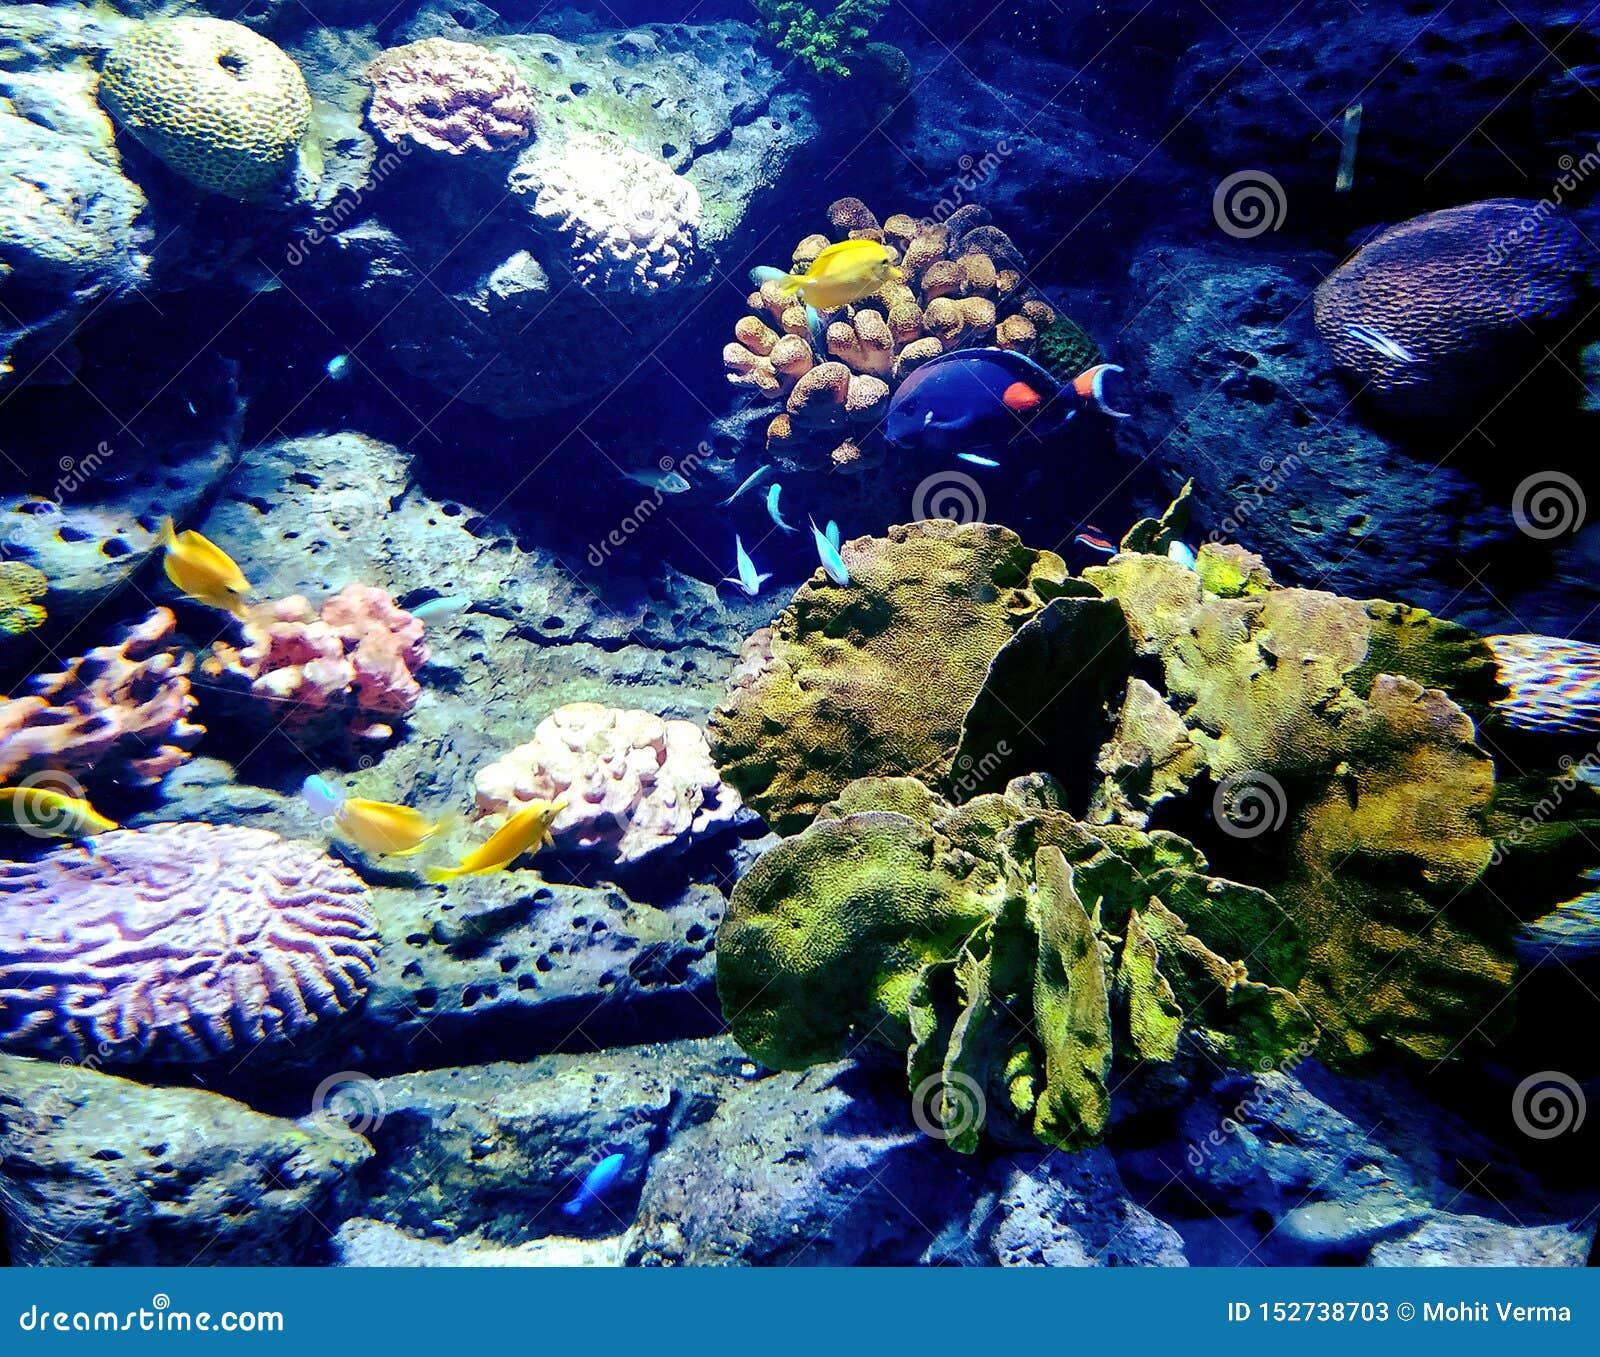 La barriera corallina dentro un oceano è un tesoro